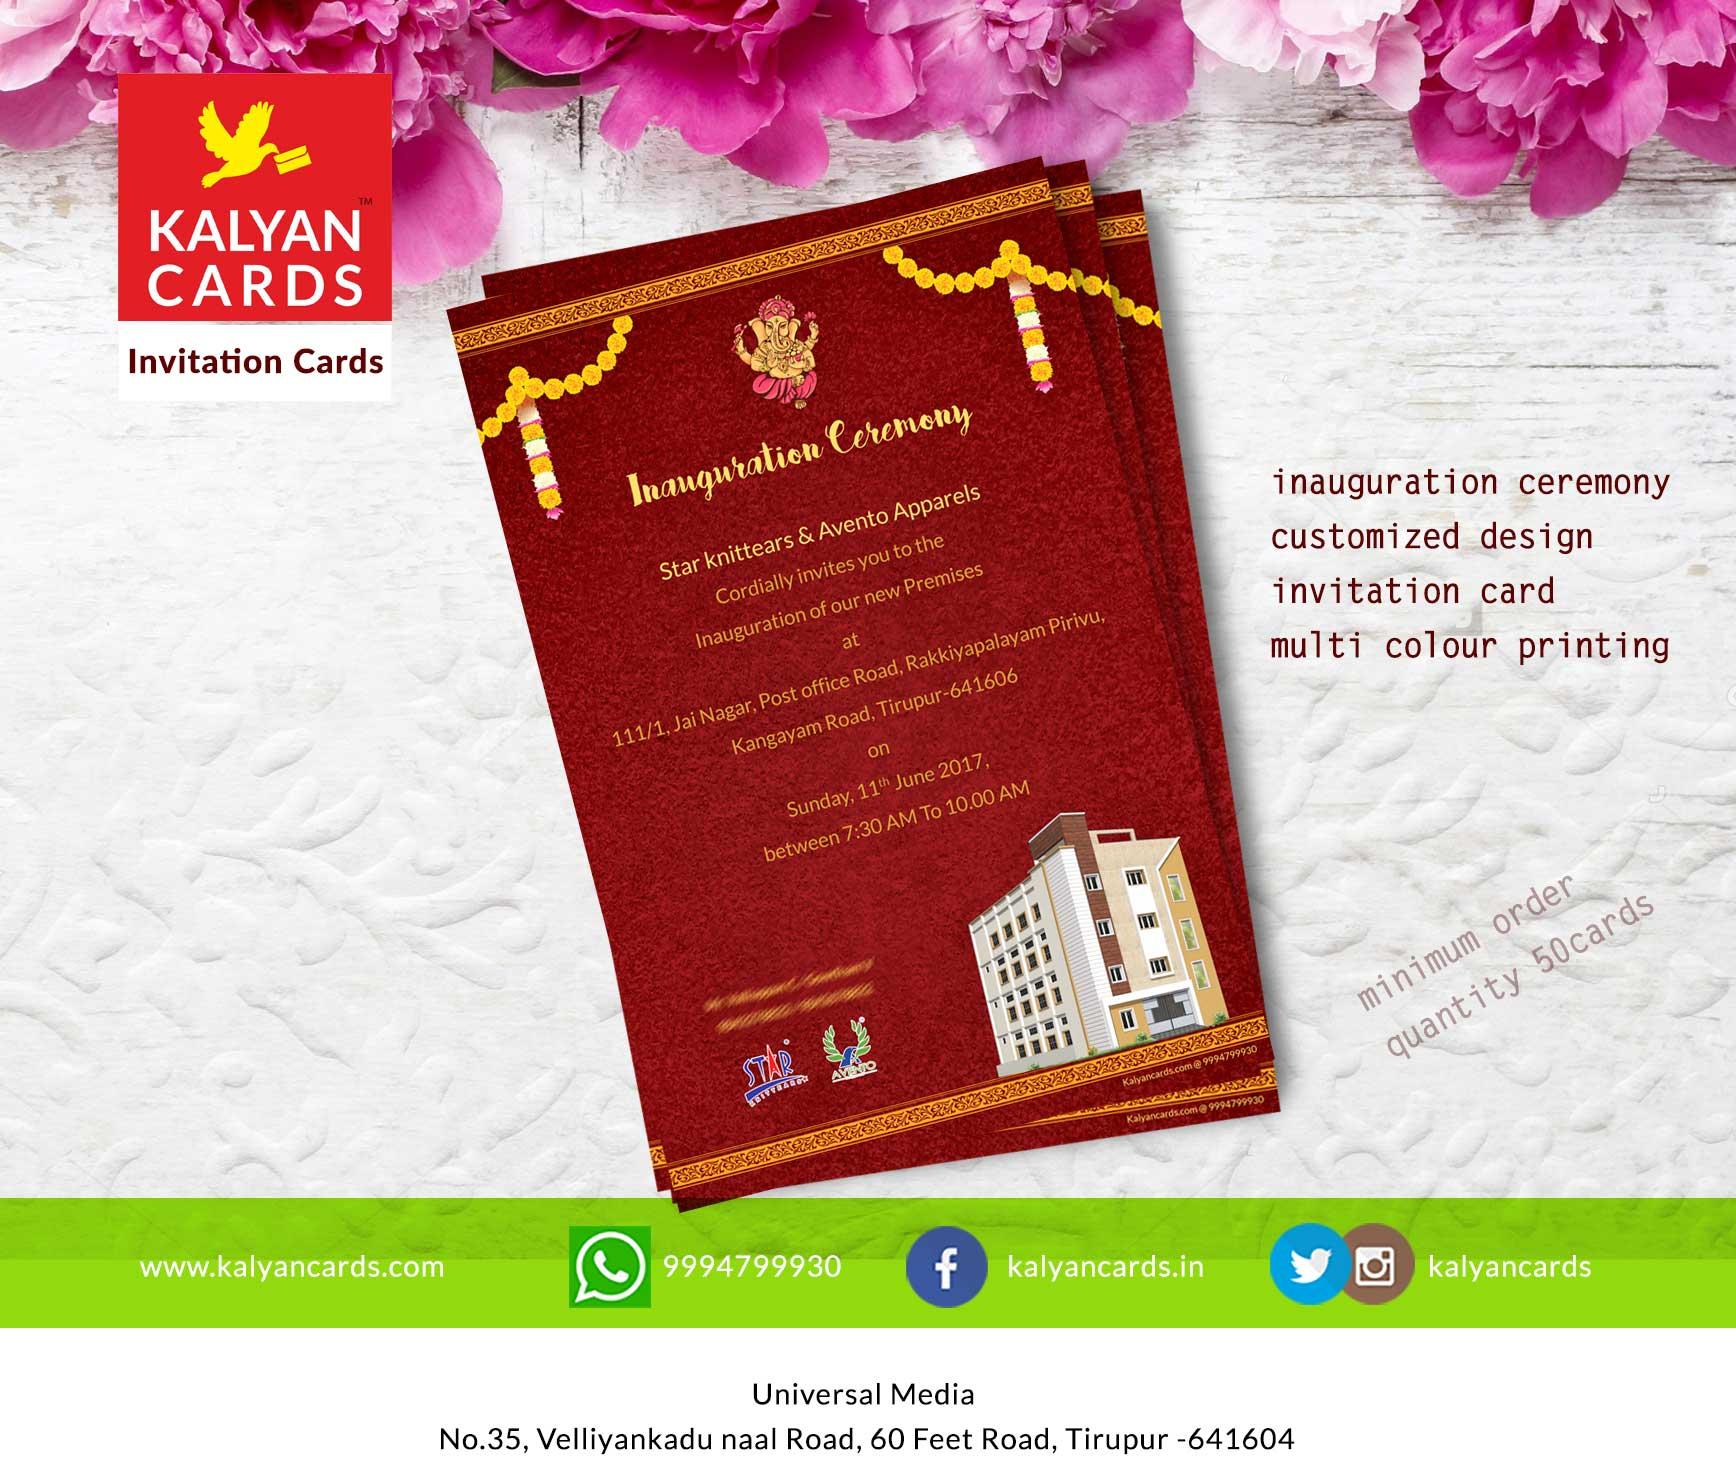 Tamil Invitation Card Printers In Bangalore - The Best Printer